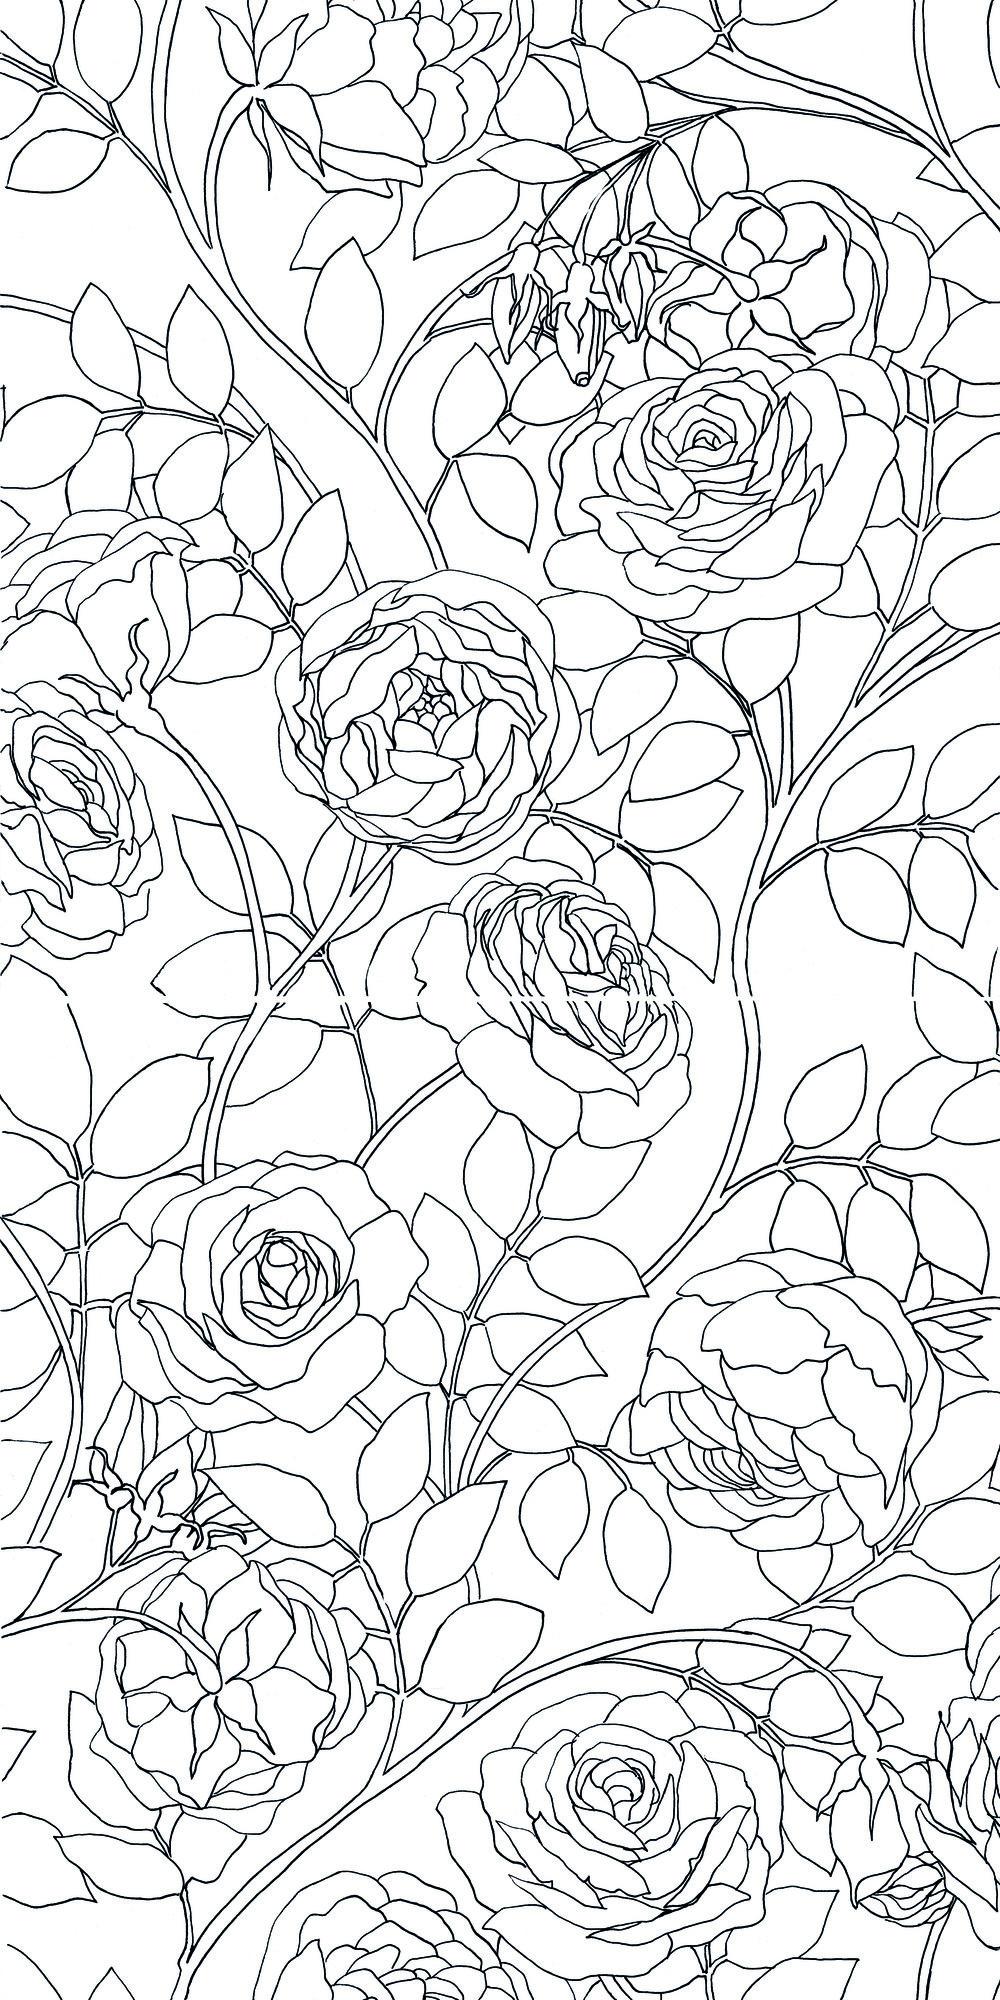 Roses_swatch.jpg